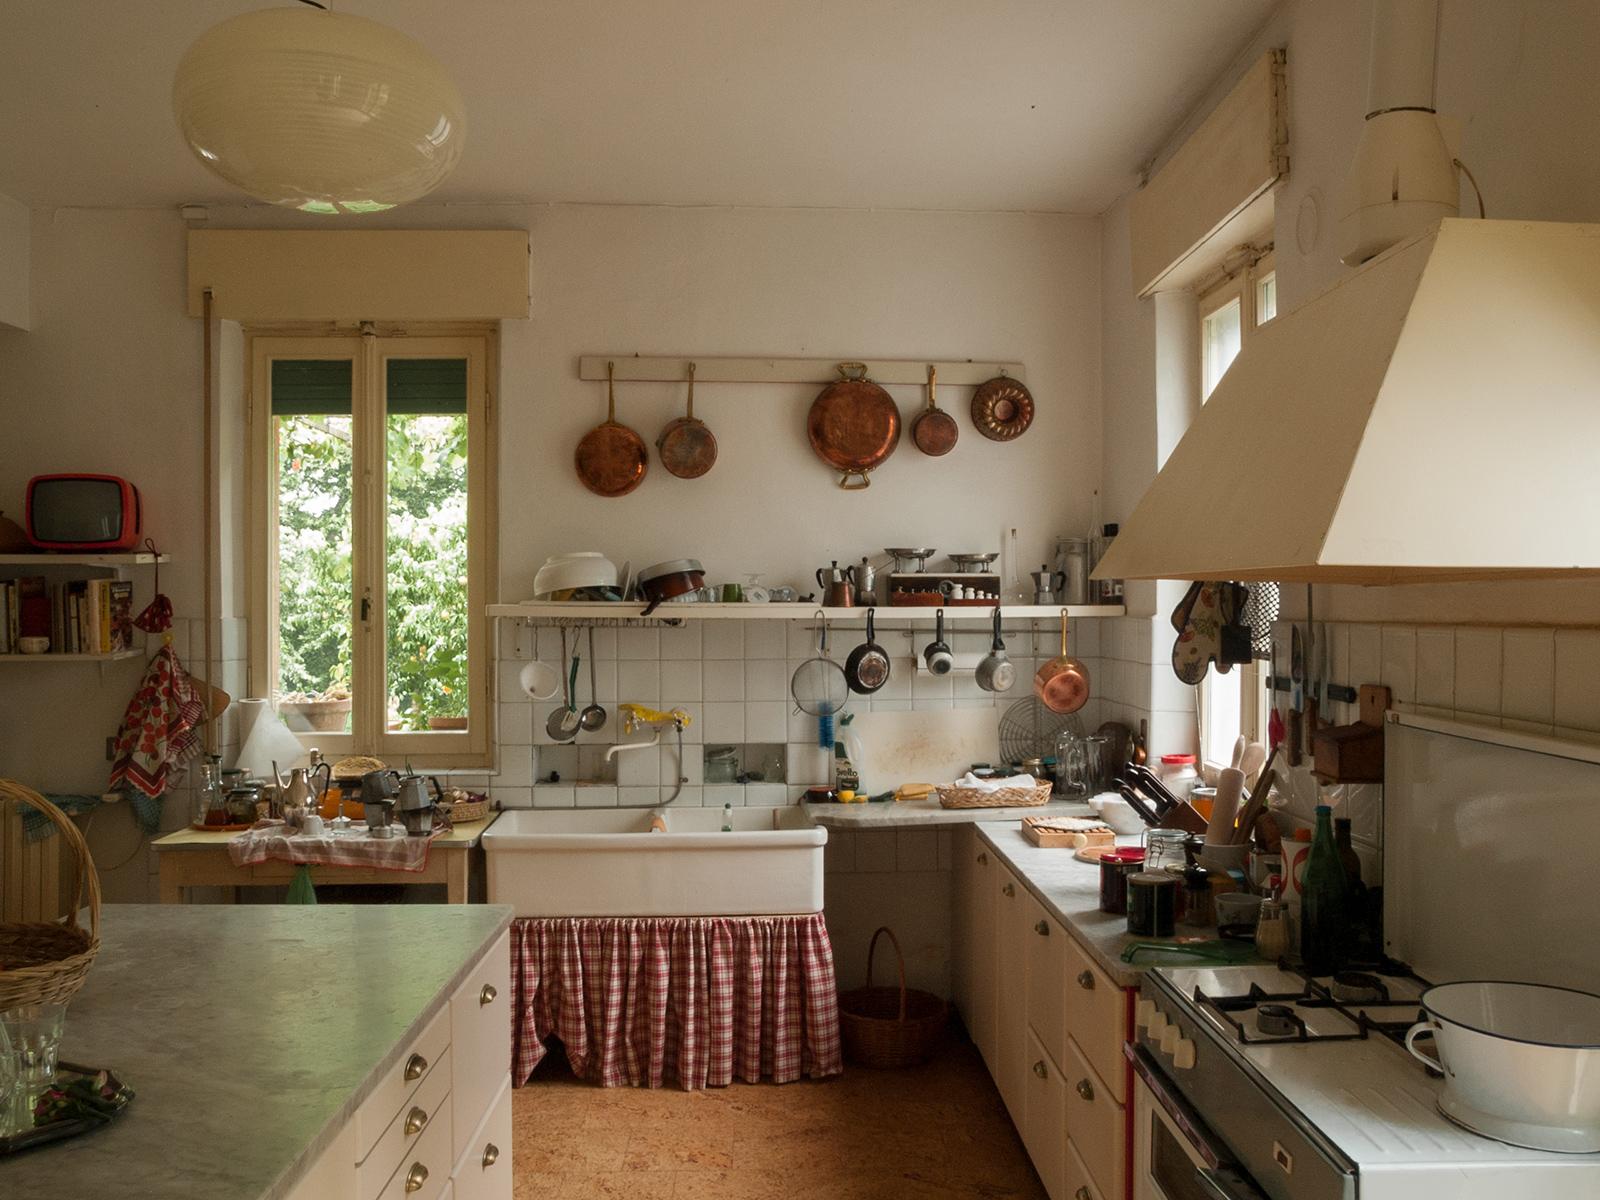 The kitchen. Photography: Giulio Ghirardi